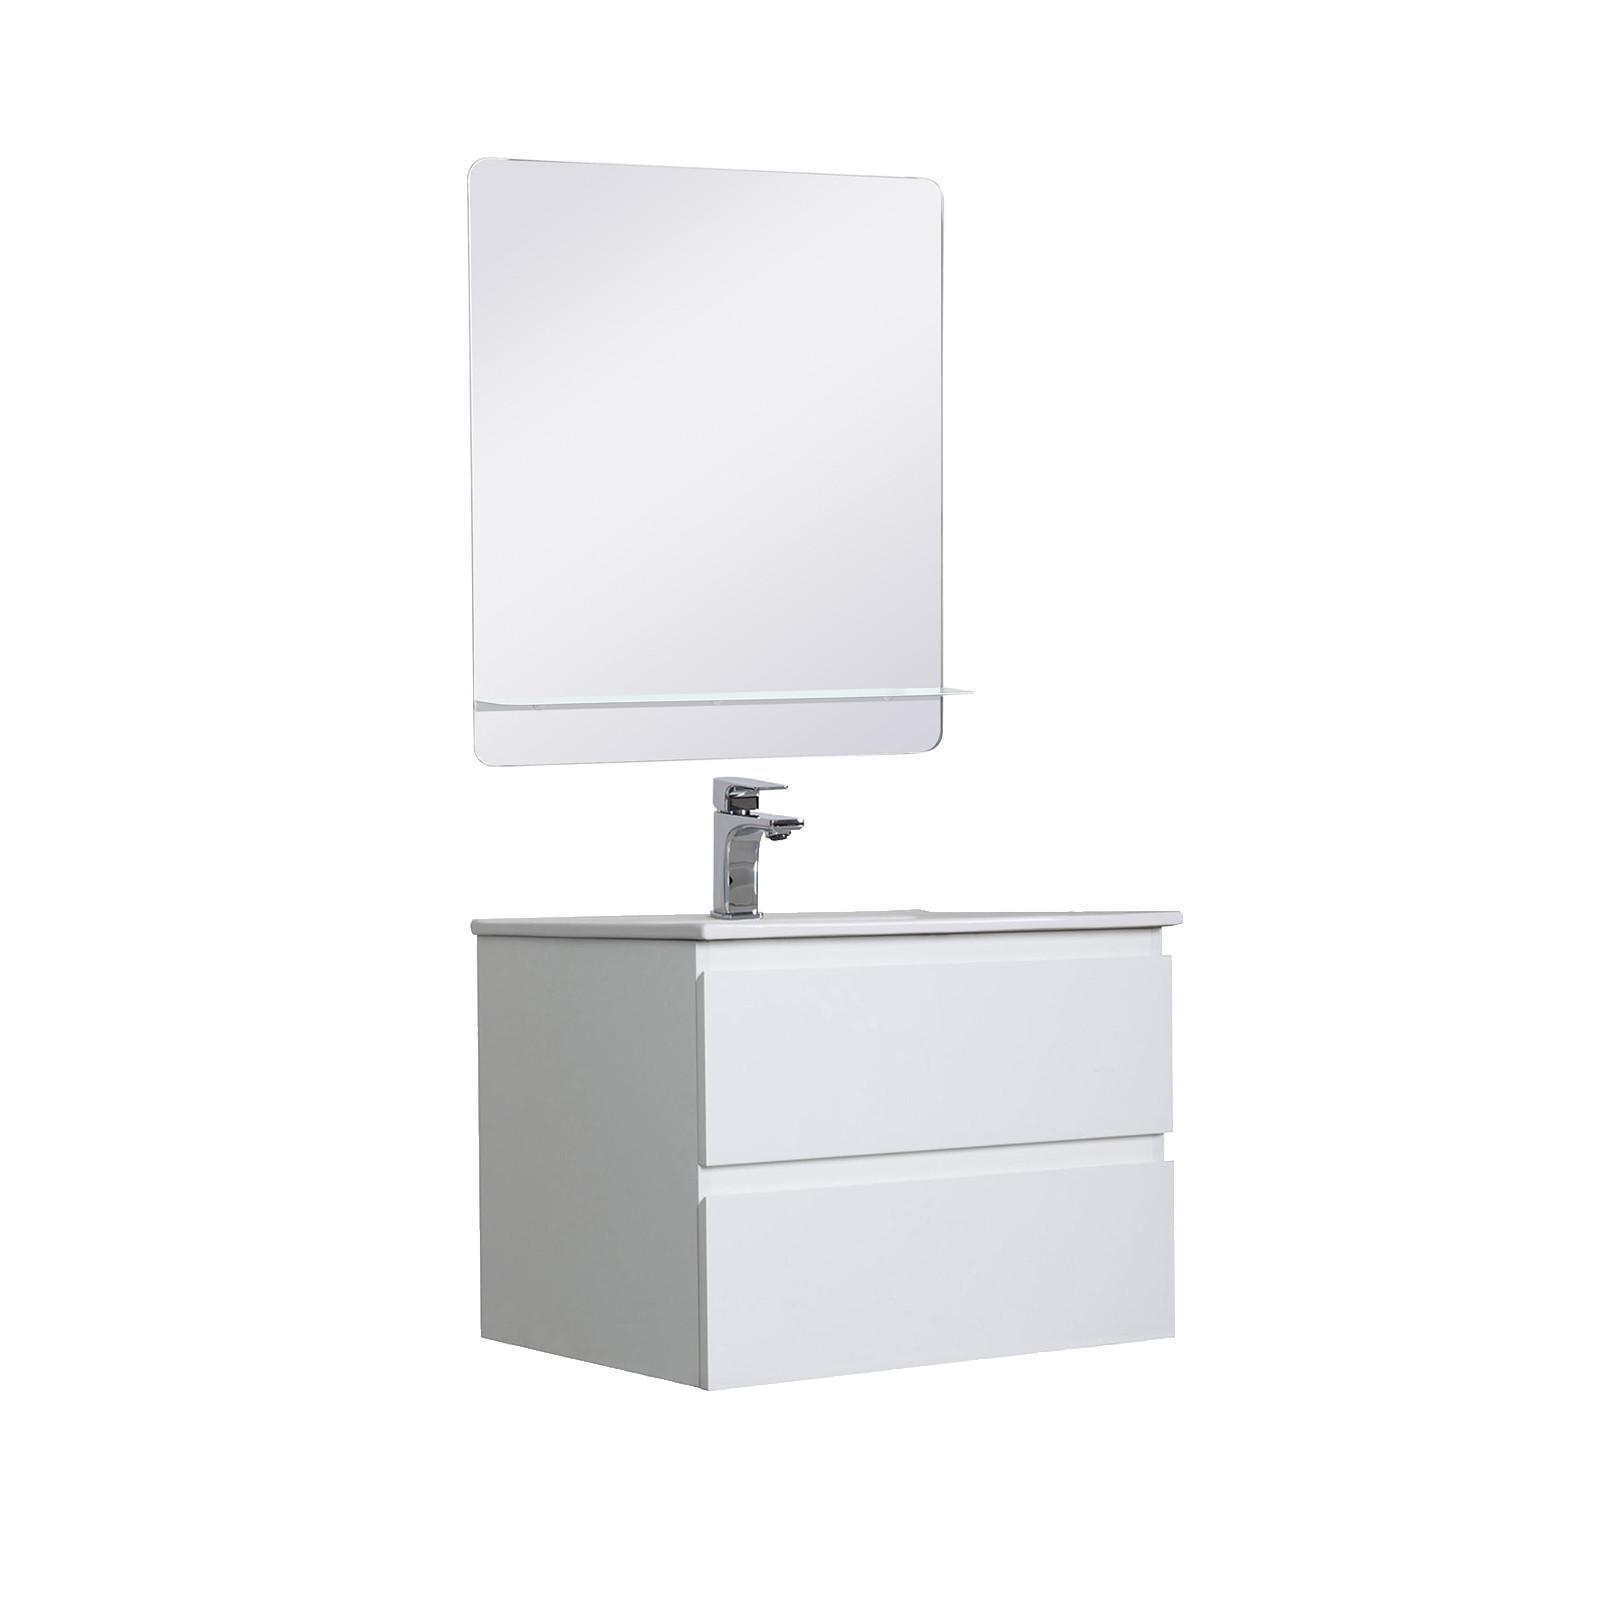 Meuble Salle de Bain 60 cm Suspendu Blanc + Miroir SORRENTO